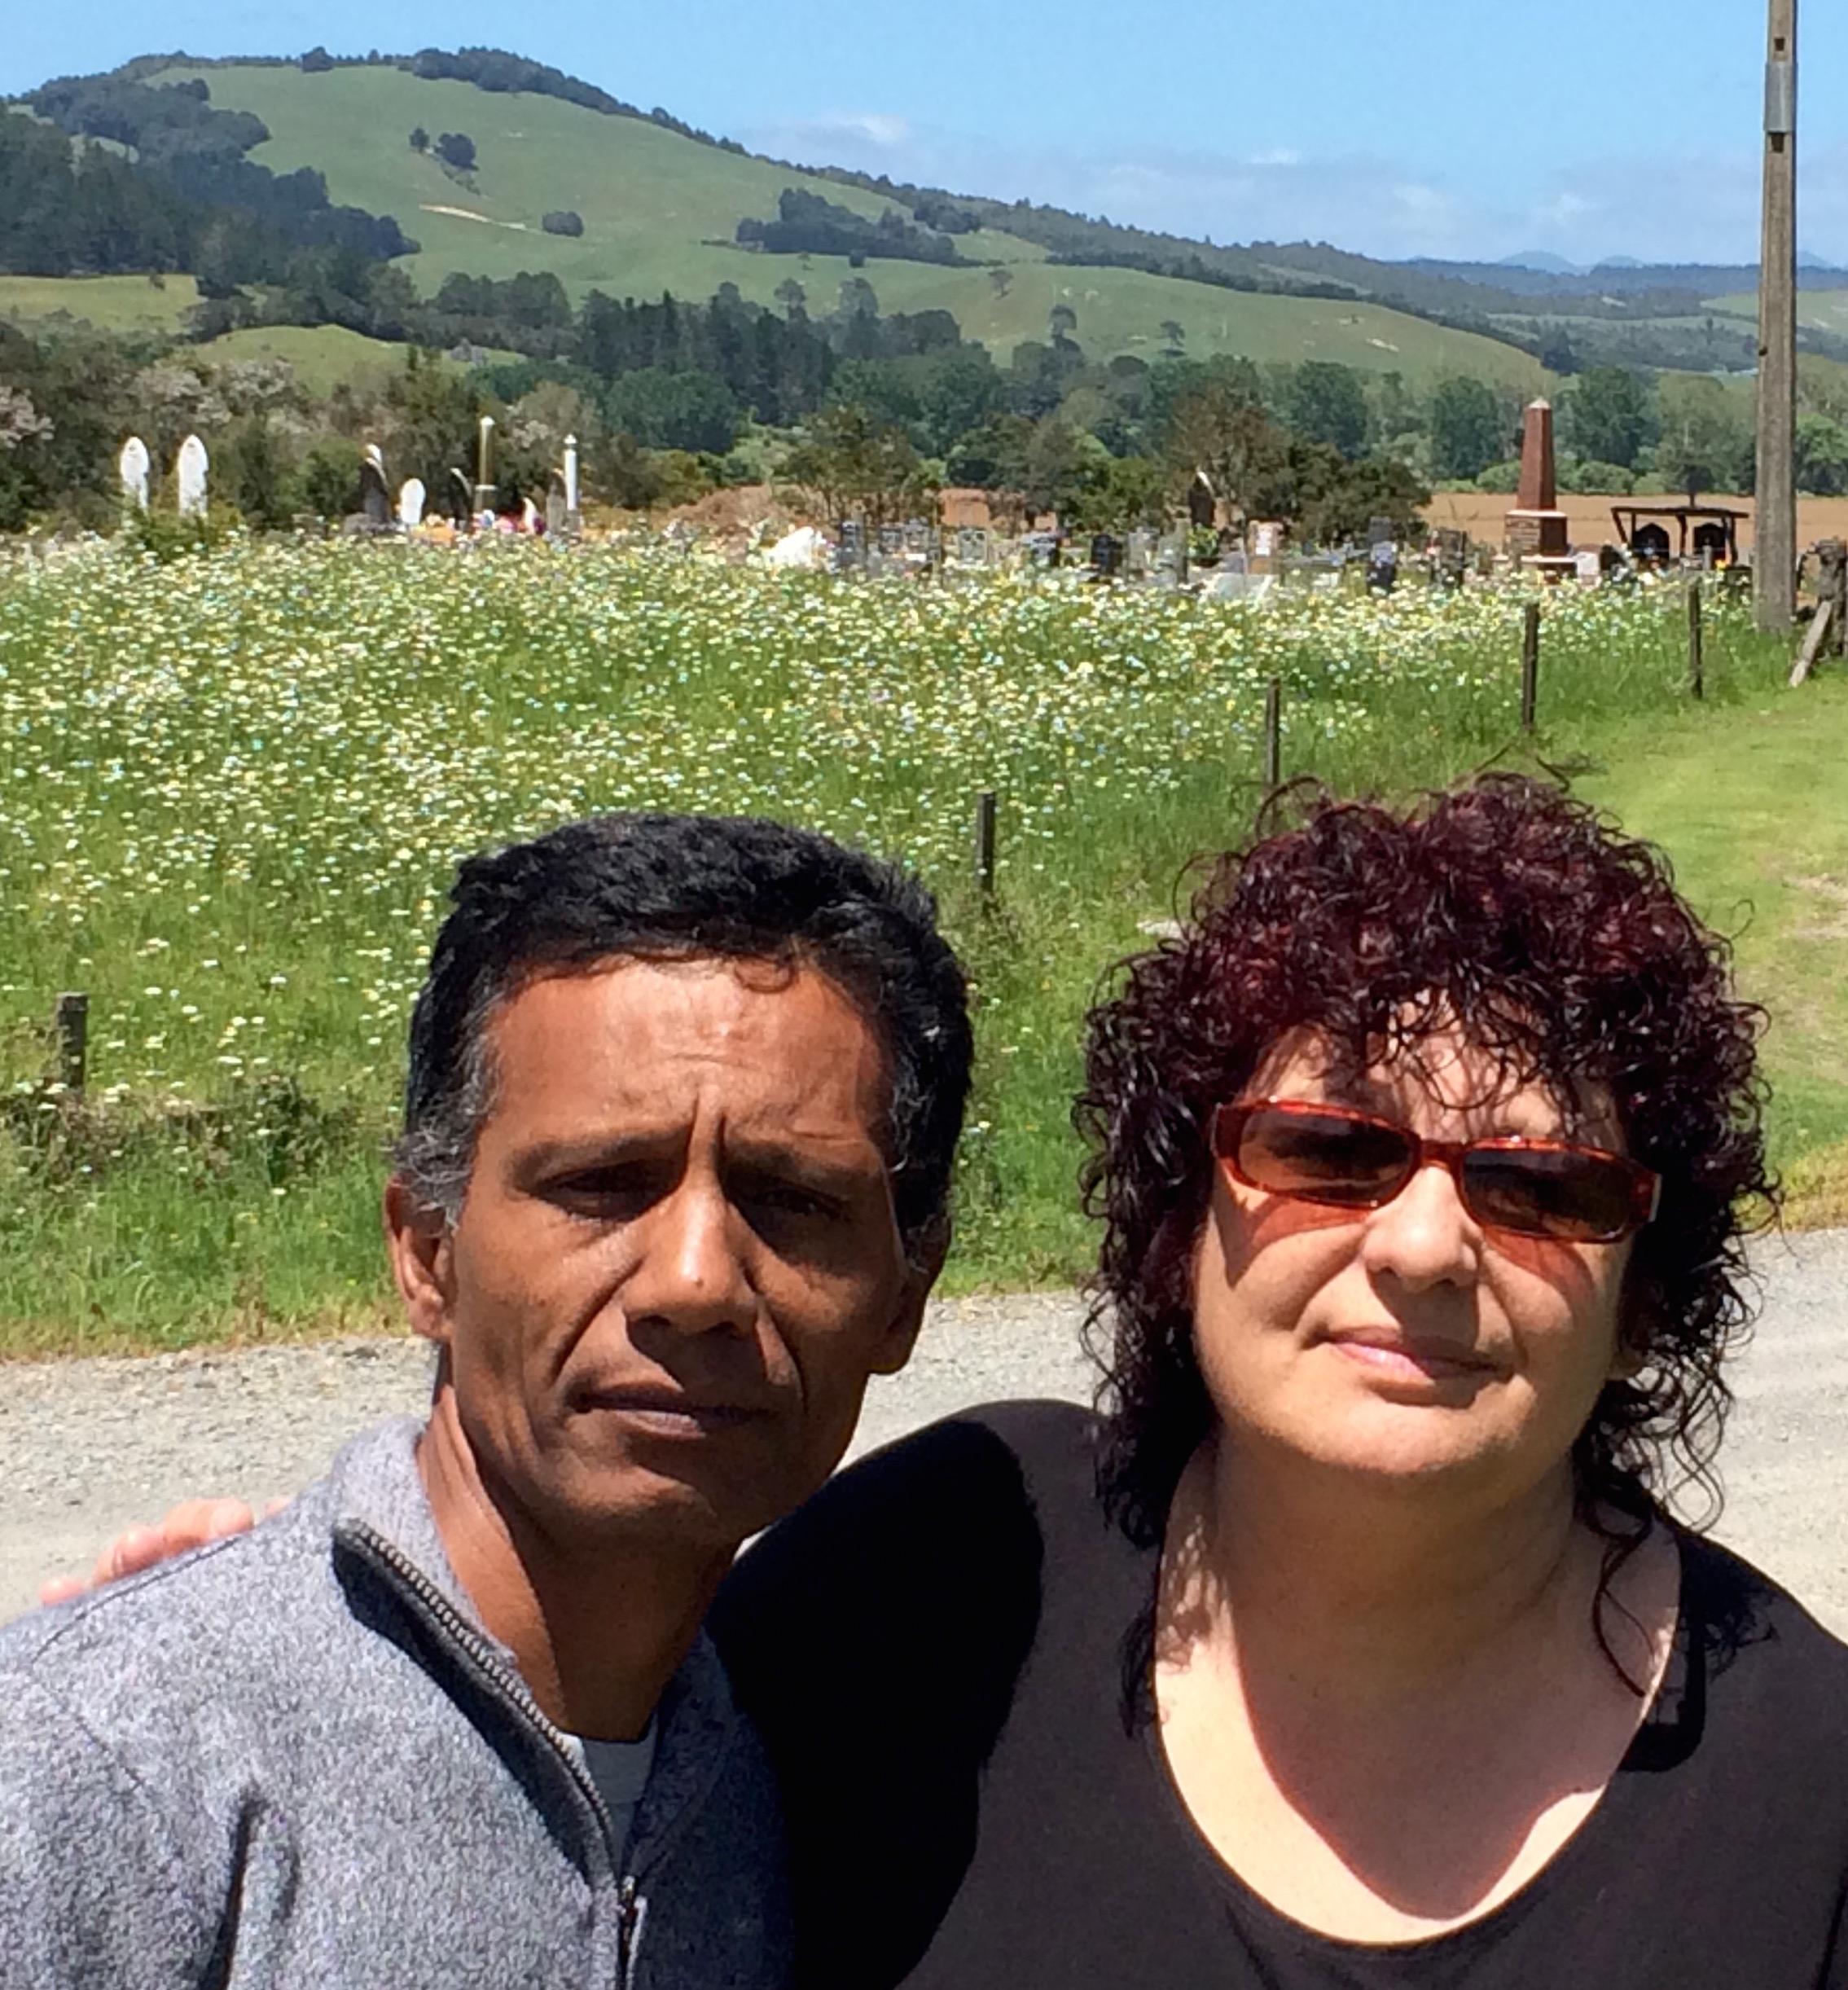 Brownie & Me, standing on ancestral land